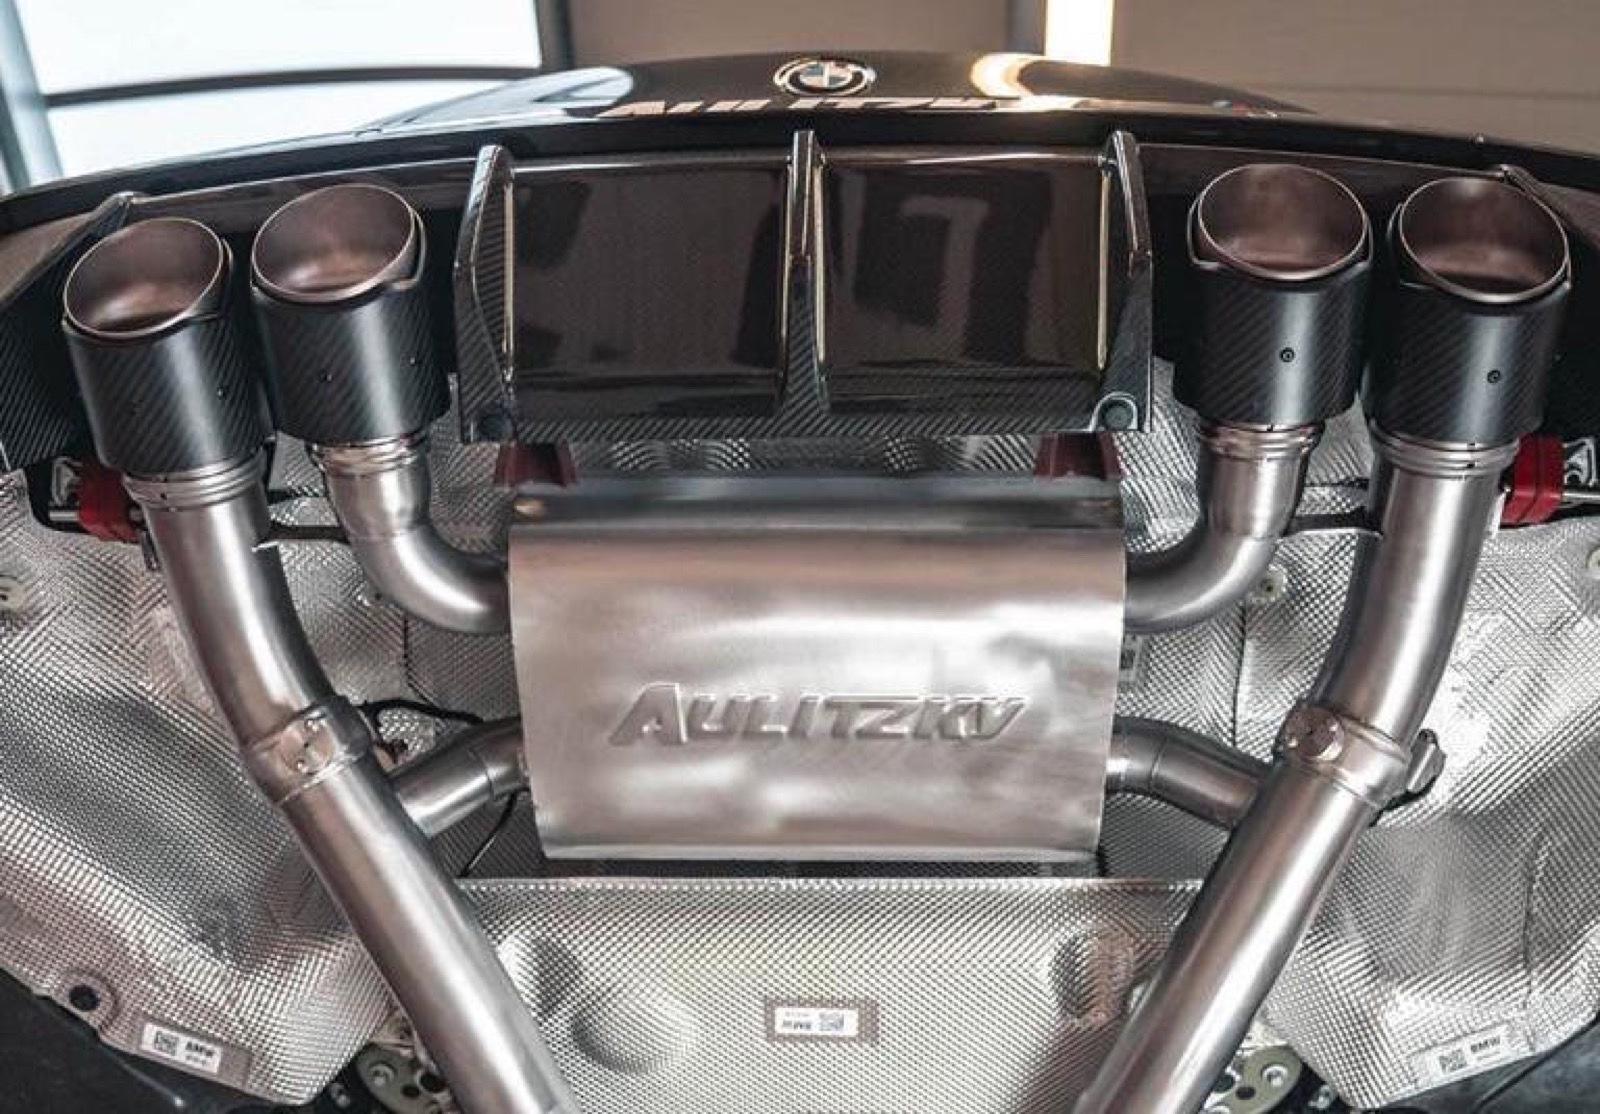 Aulitzky_M3-0007